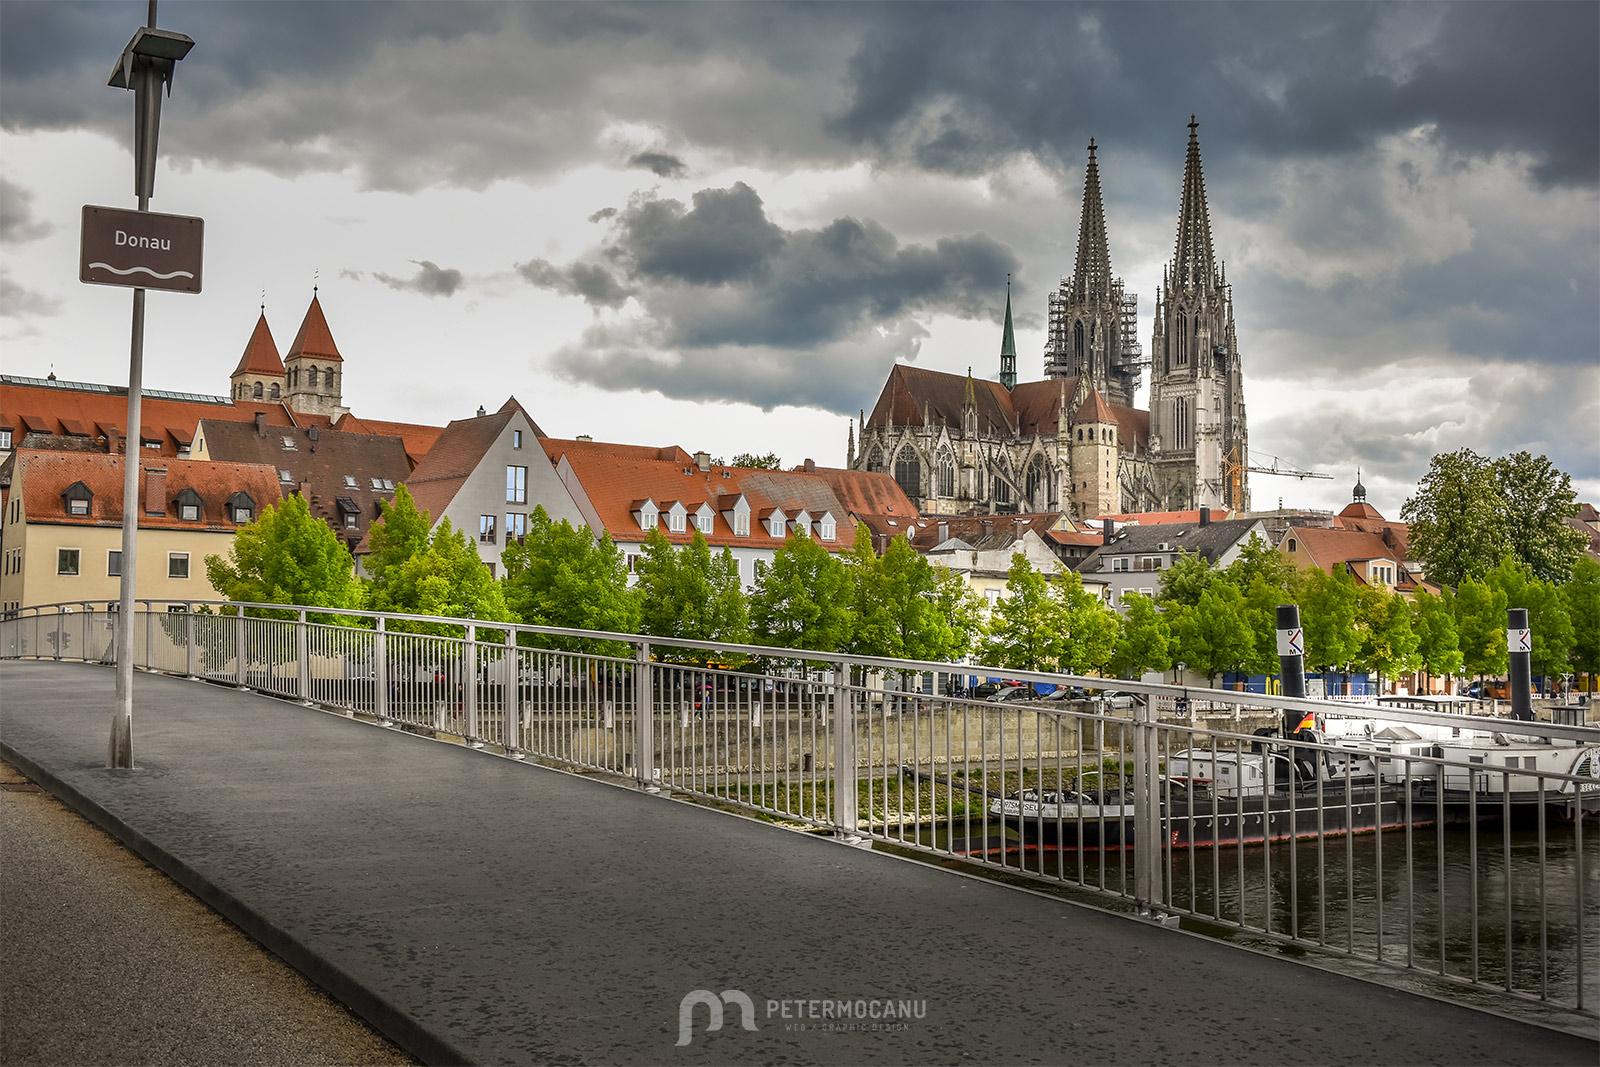 Regensburg St. Peter Cathedral